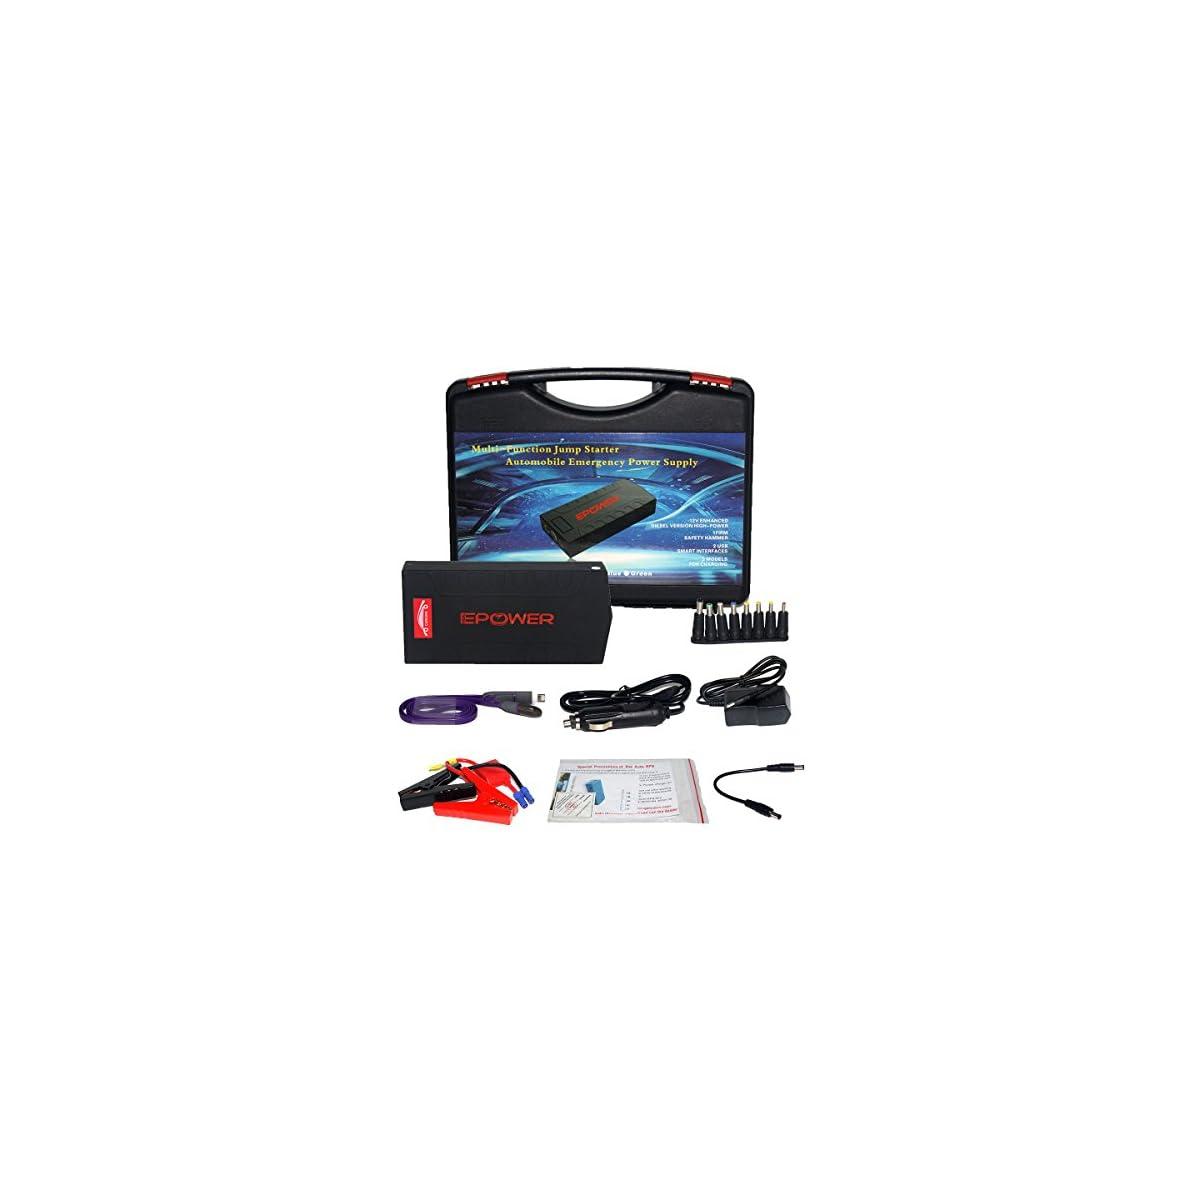 51kdTh3X0LL. SS1200  - CS-07 Jump Starter 18000mAh 12V Energía Arranque Emergencia para Coche,iPhone iPad BQ Samsung y Otro Movíl Inteligente,Tablet PC con Linterna LED & Cargador de Batería Externa del Coche